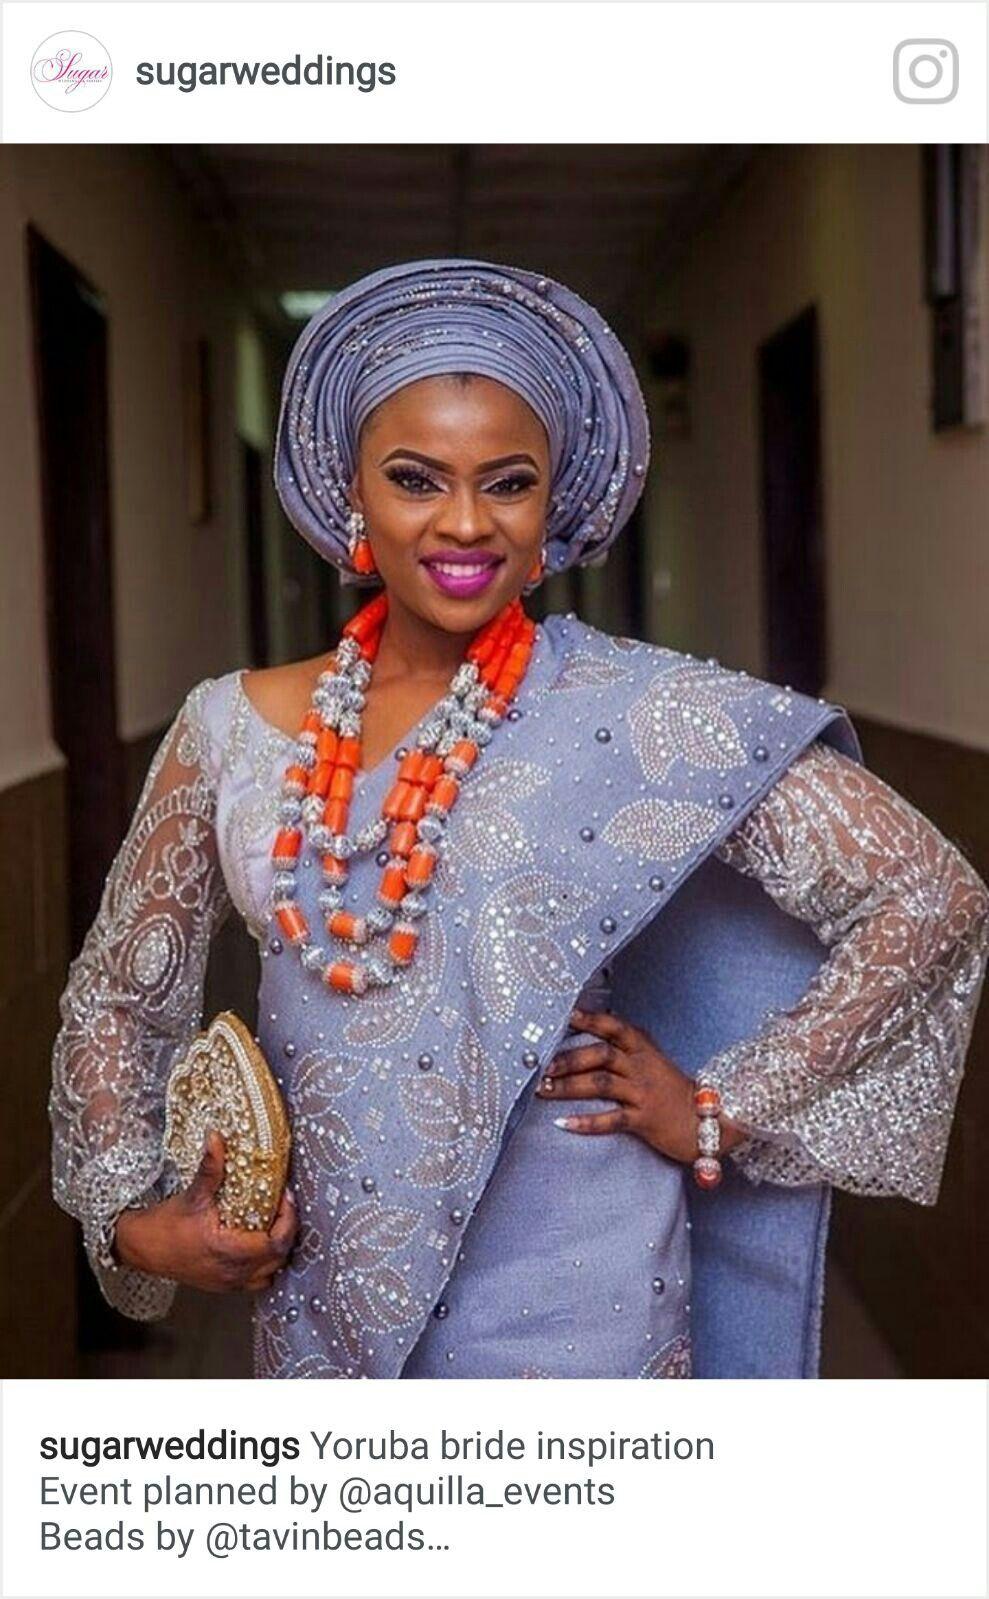 Nigerian traditional wedding decor ideas  Pin by Ruka Oyedele on yigi  Pinterest